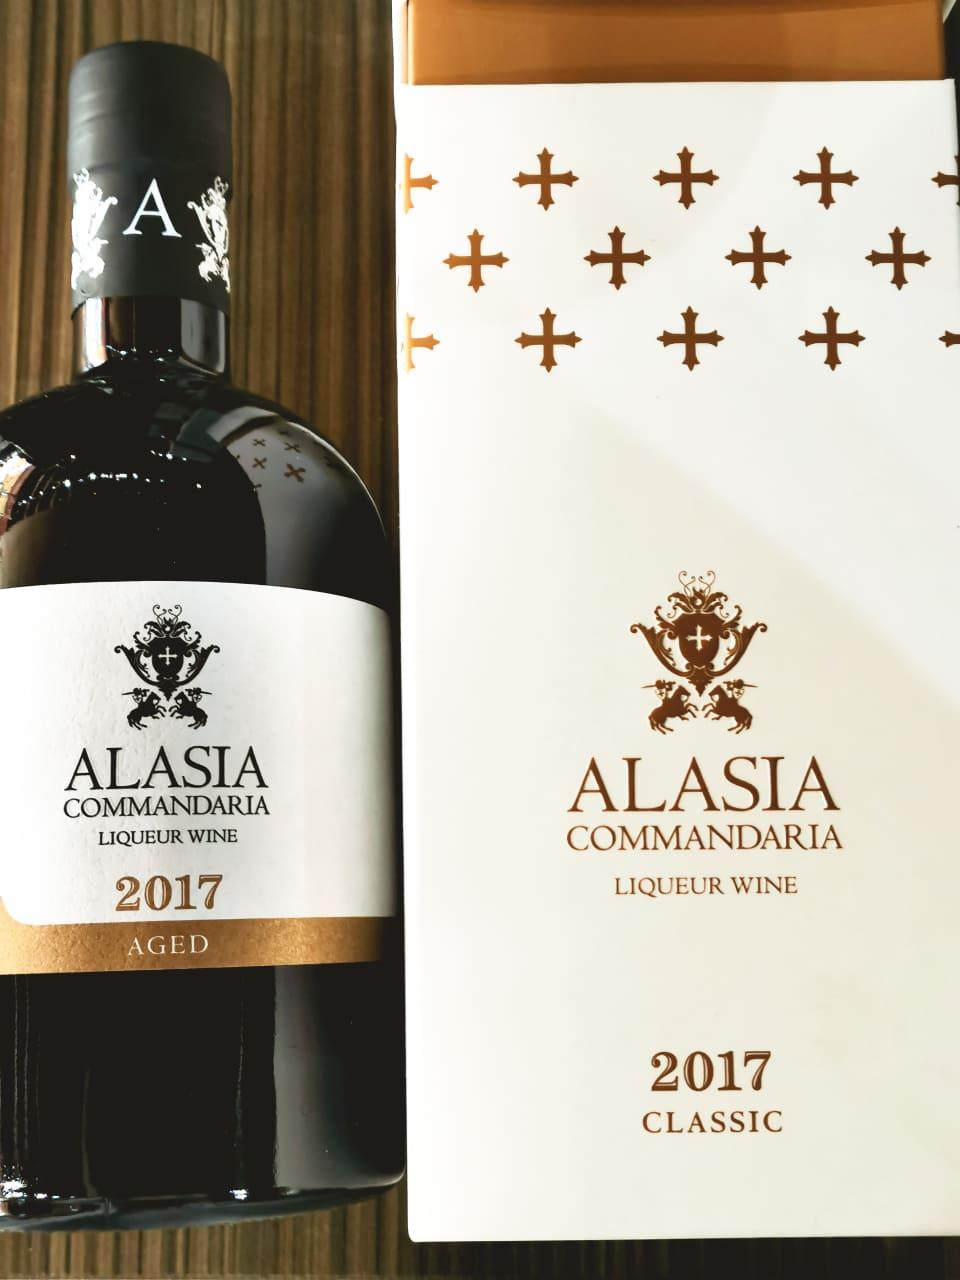 ALASIA COMMANDARIA 2017 CLASSIC 50CL